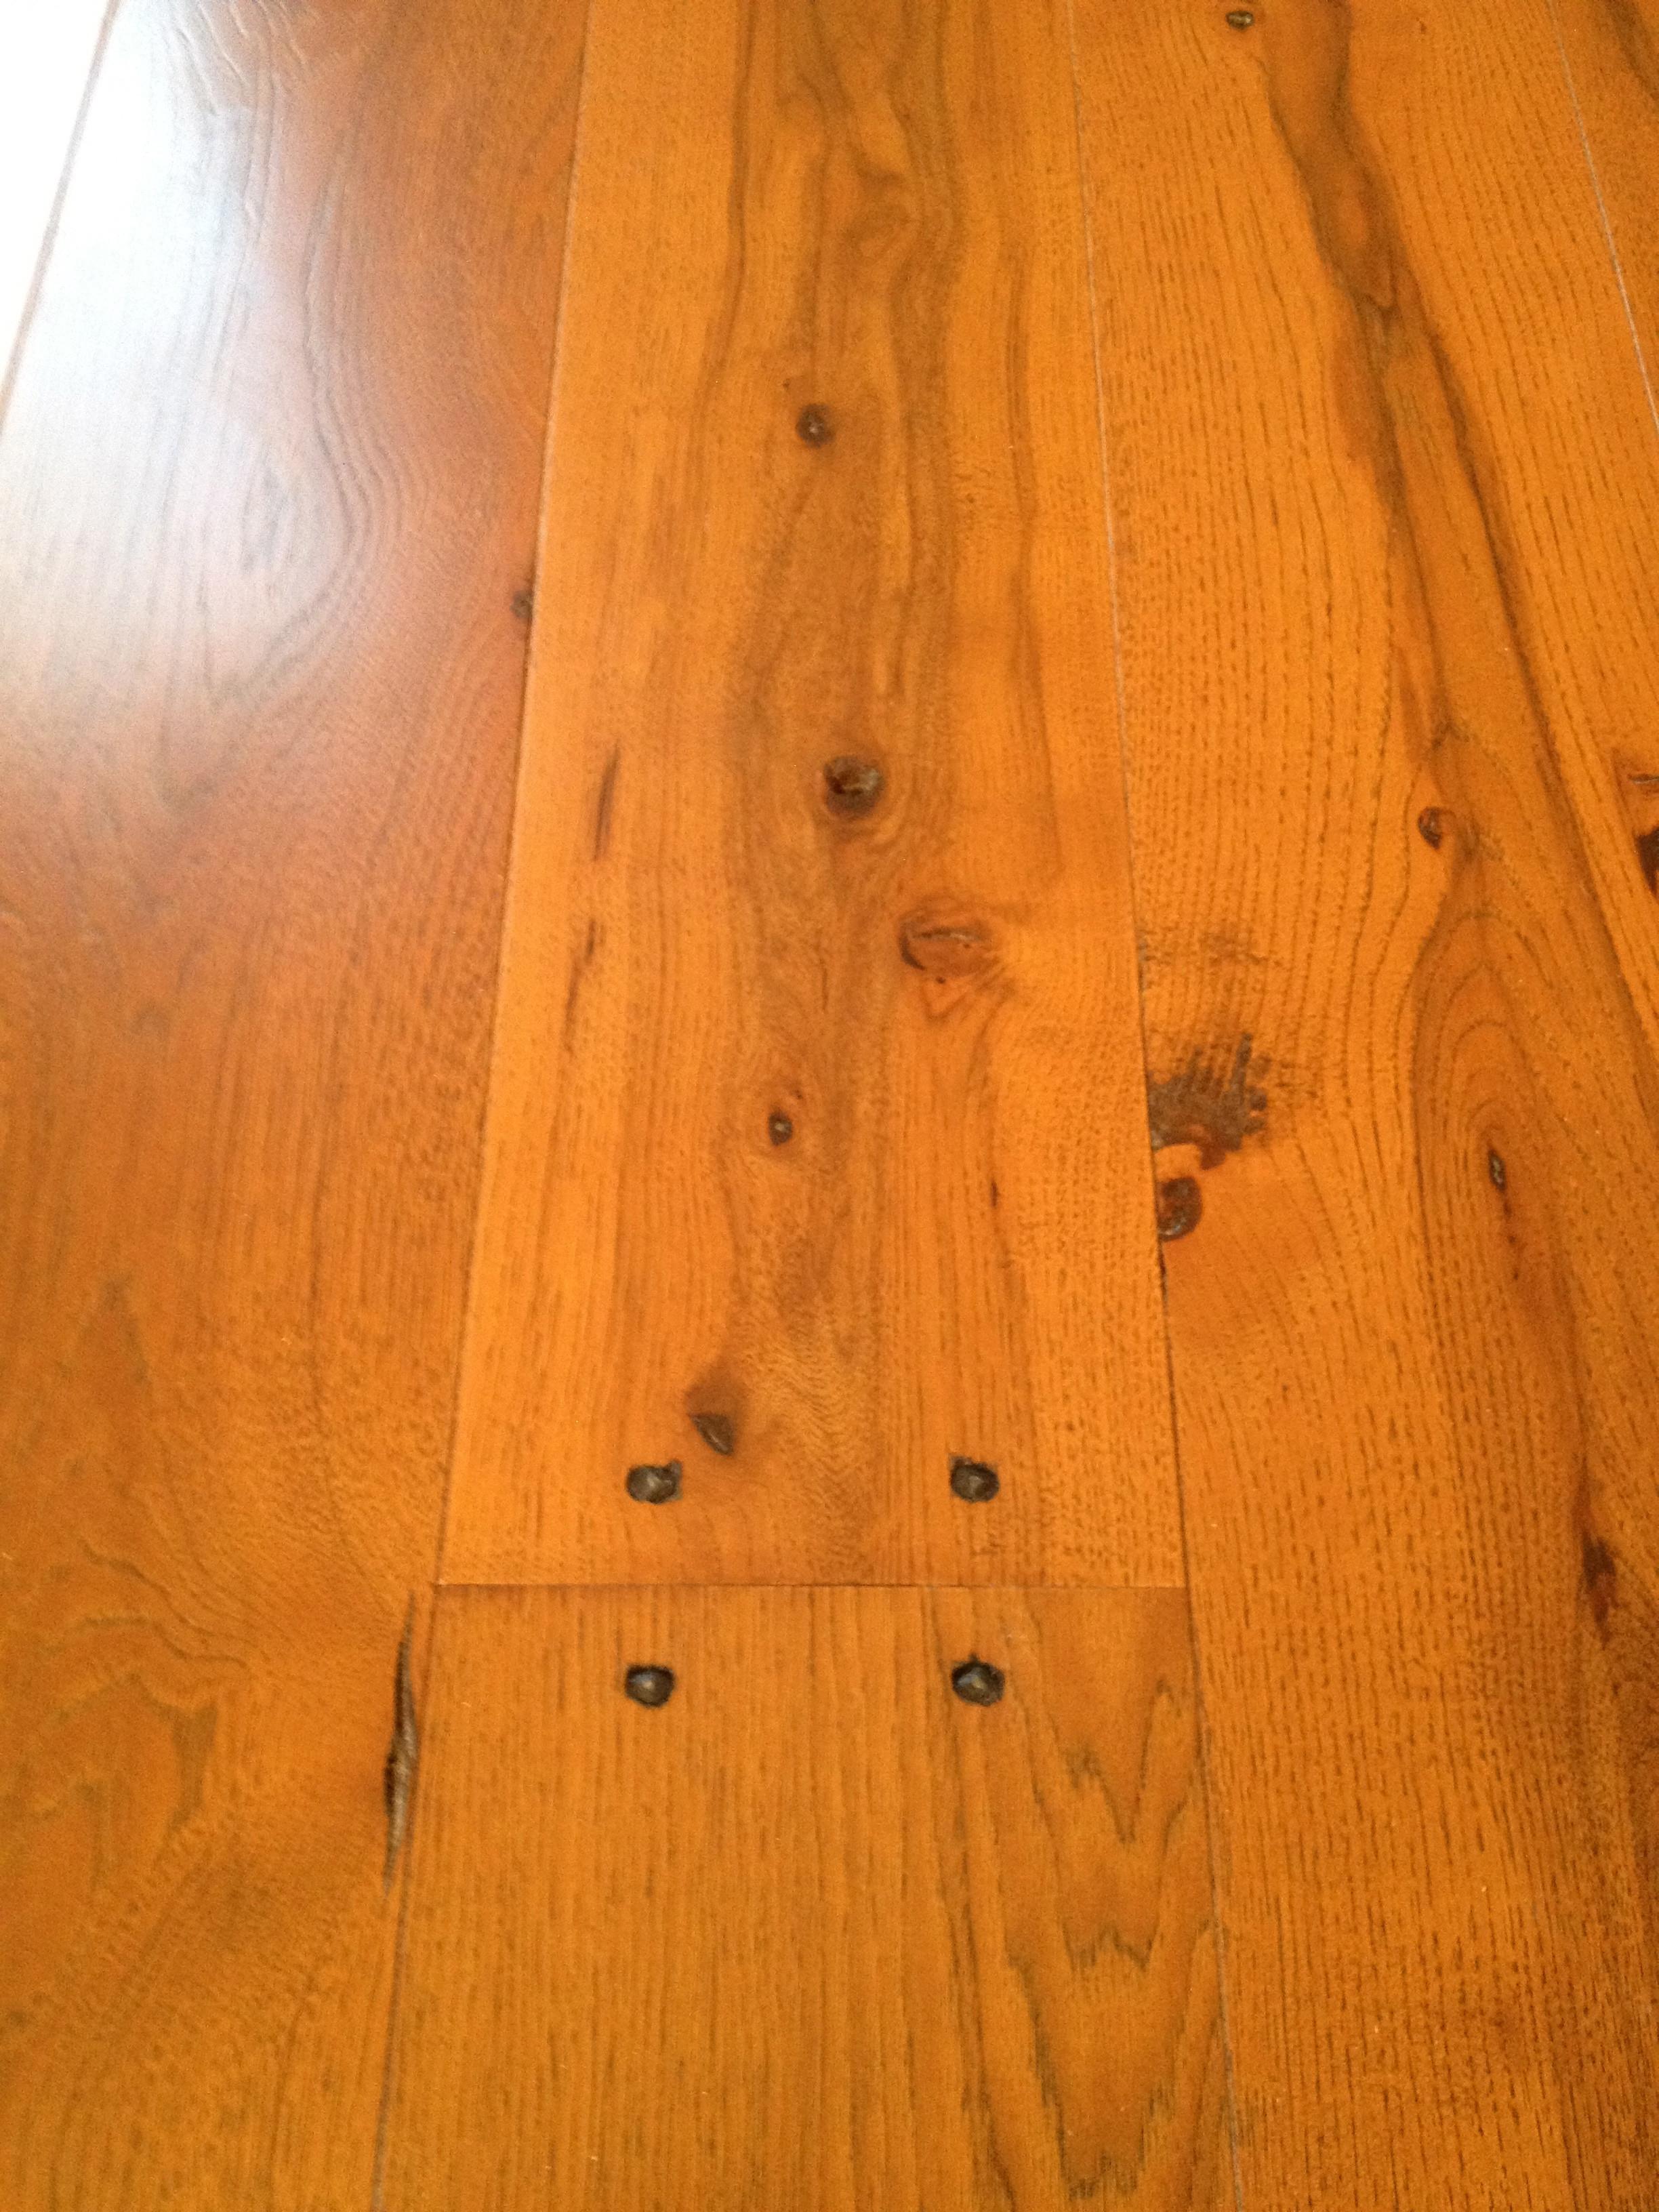 replacing glued down hardwood floor of flooring portfolio gorsegner brothers regarding img 0322